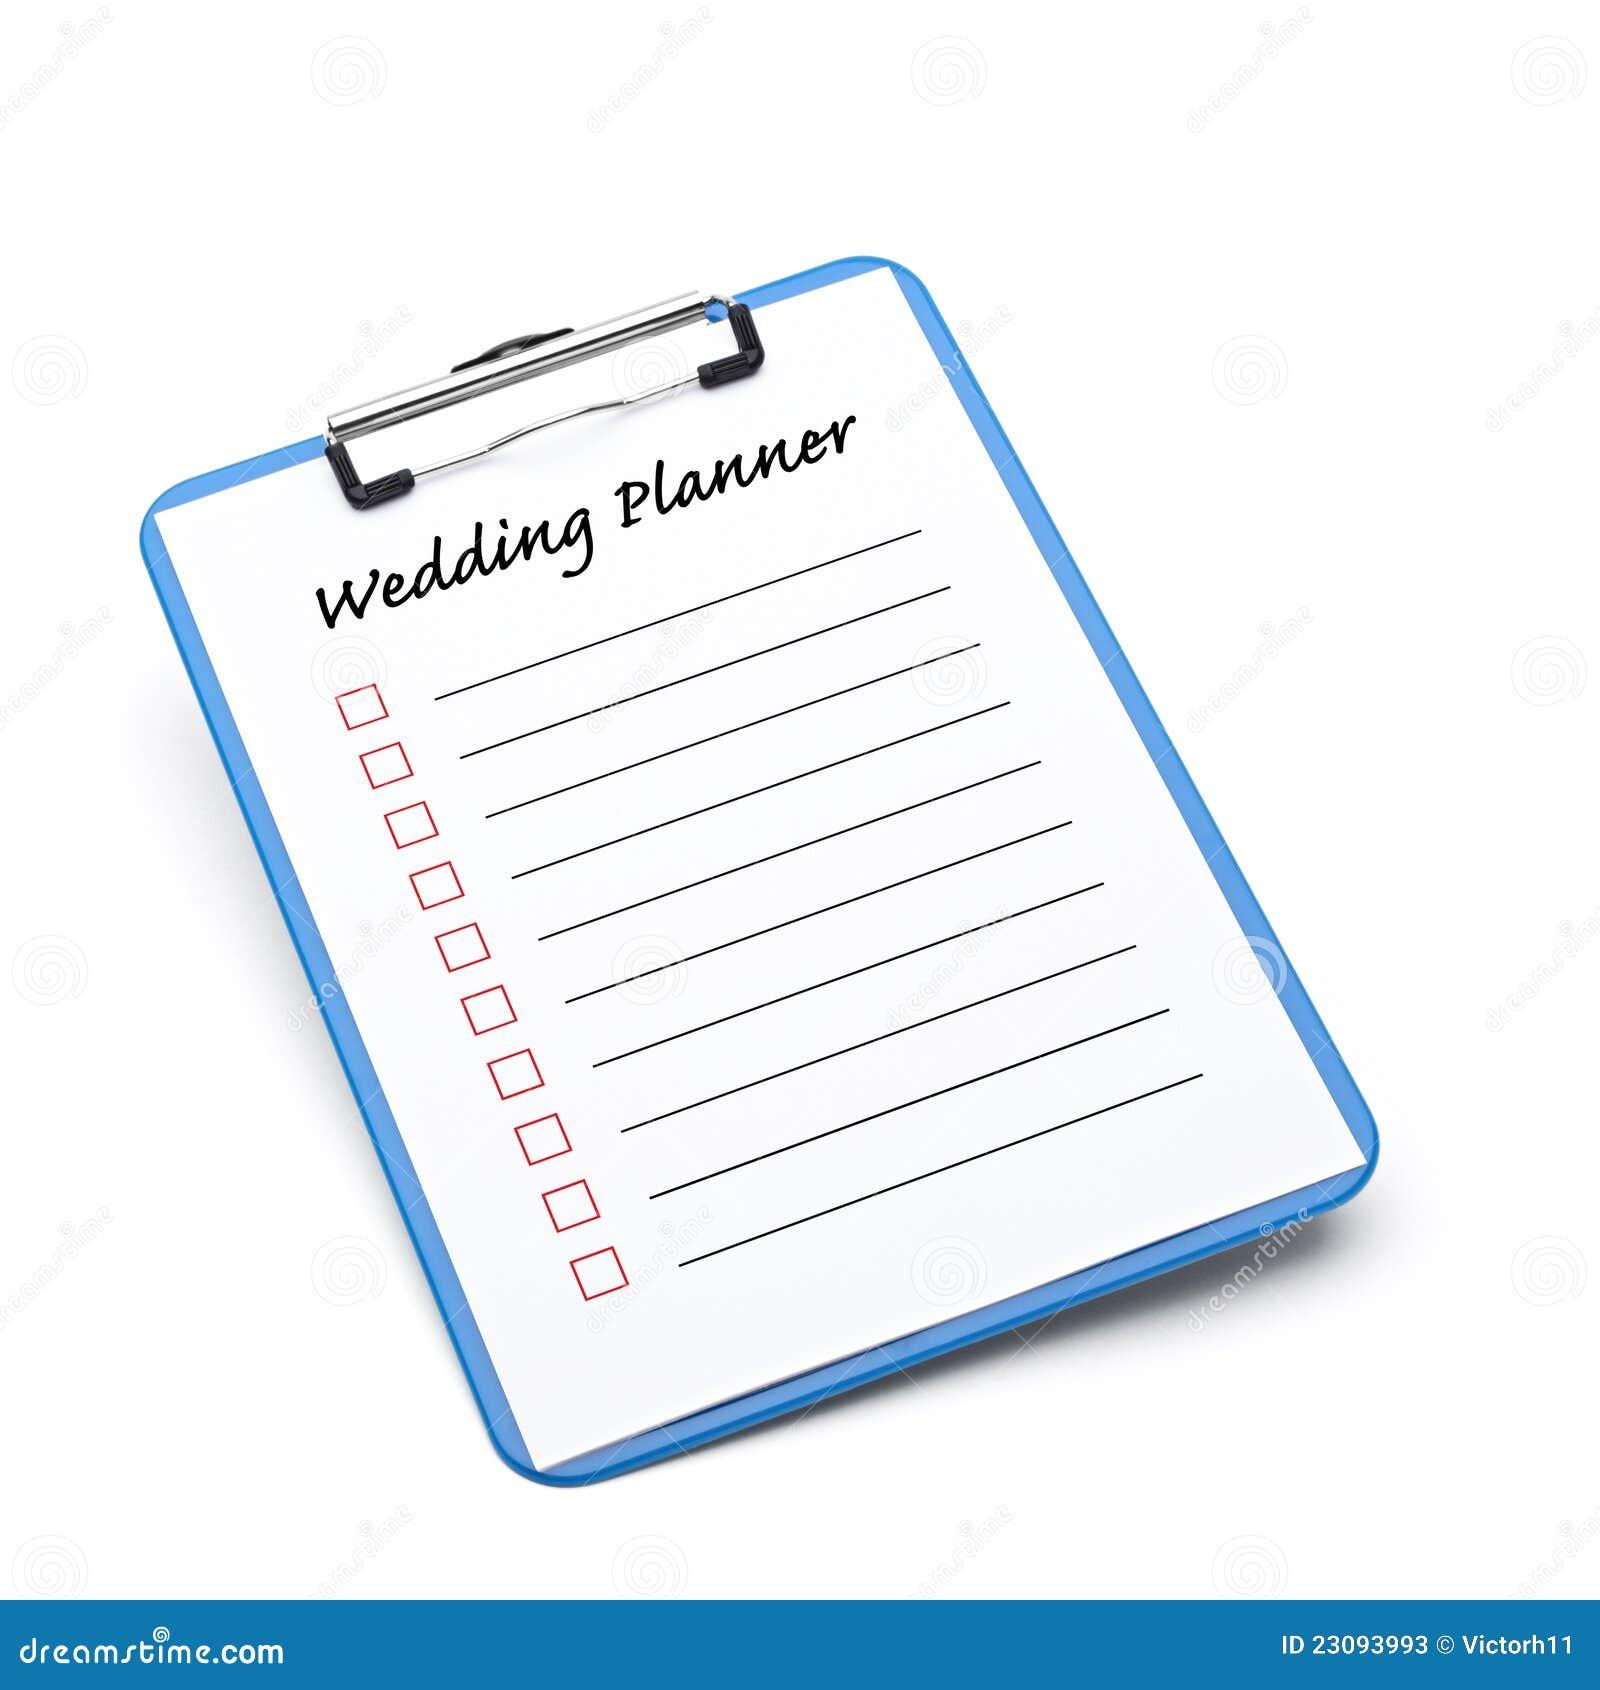 Wedding planner stock photos image 23093993 royalty free stock photo download wedding planner junglespirit Choice Image